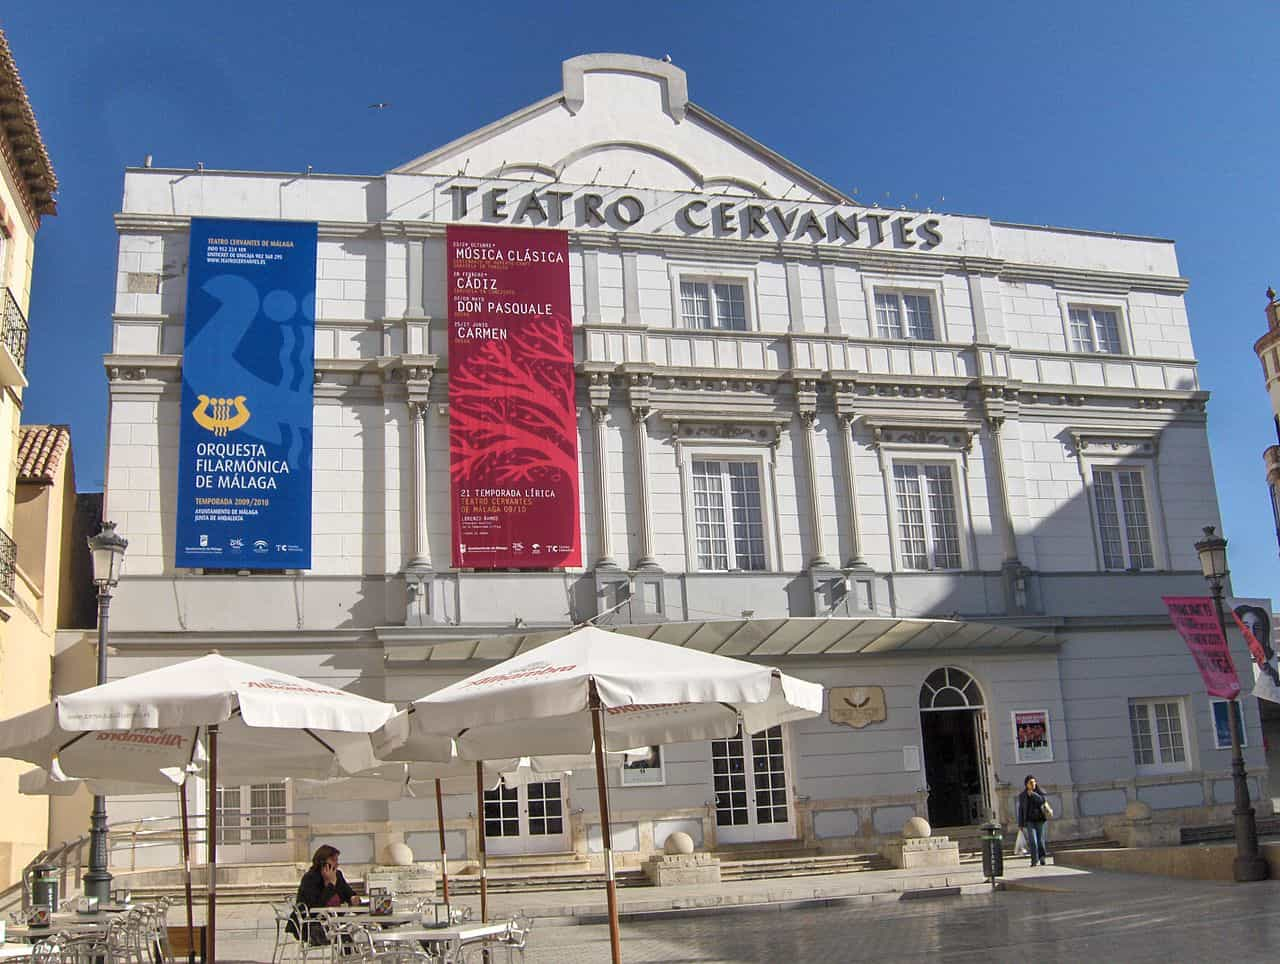 Teatro Cervantes en Malaga